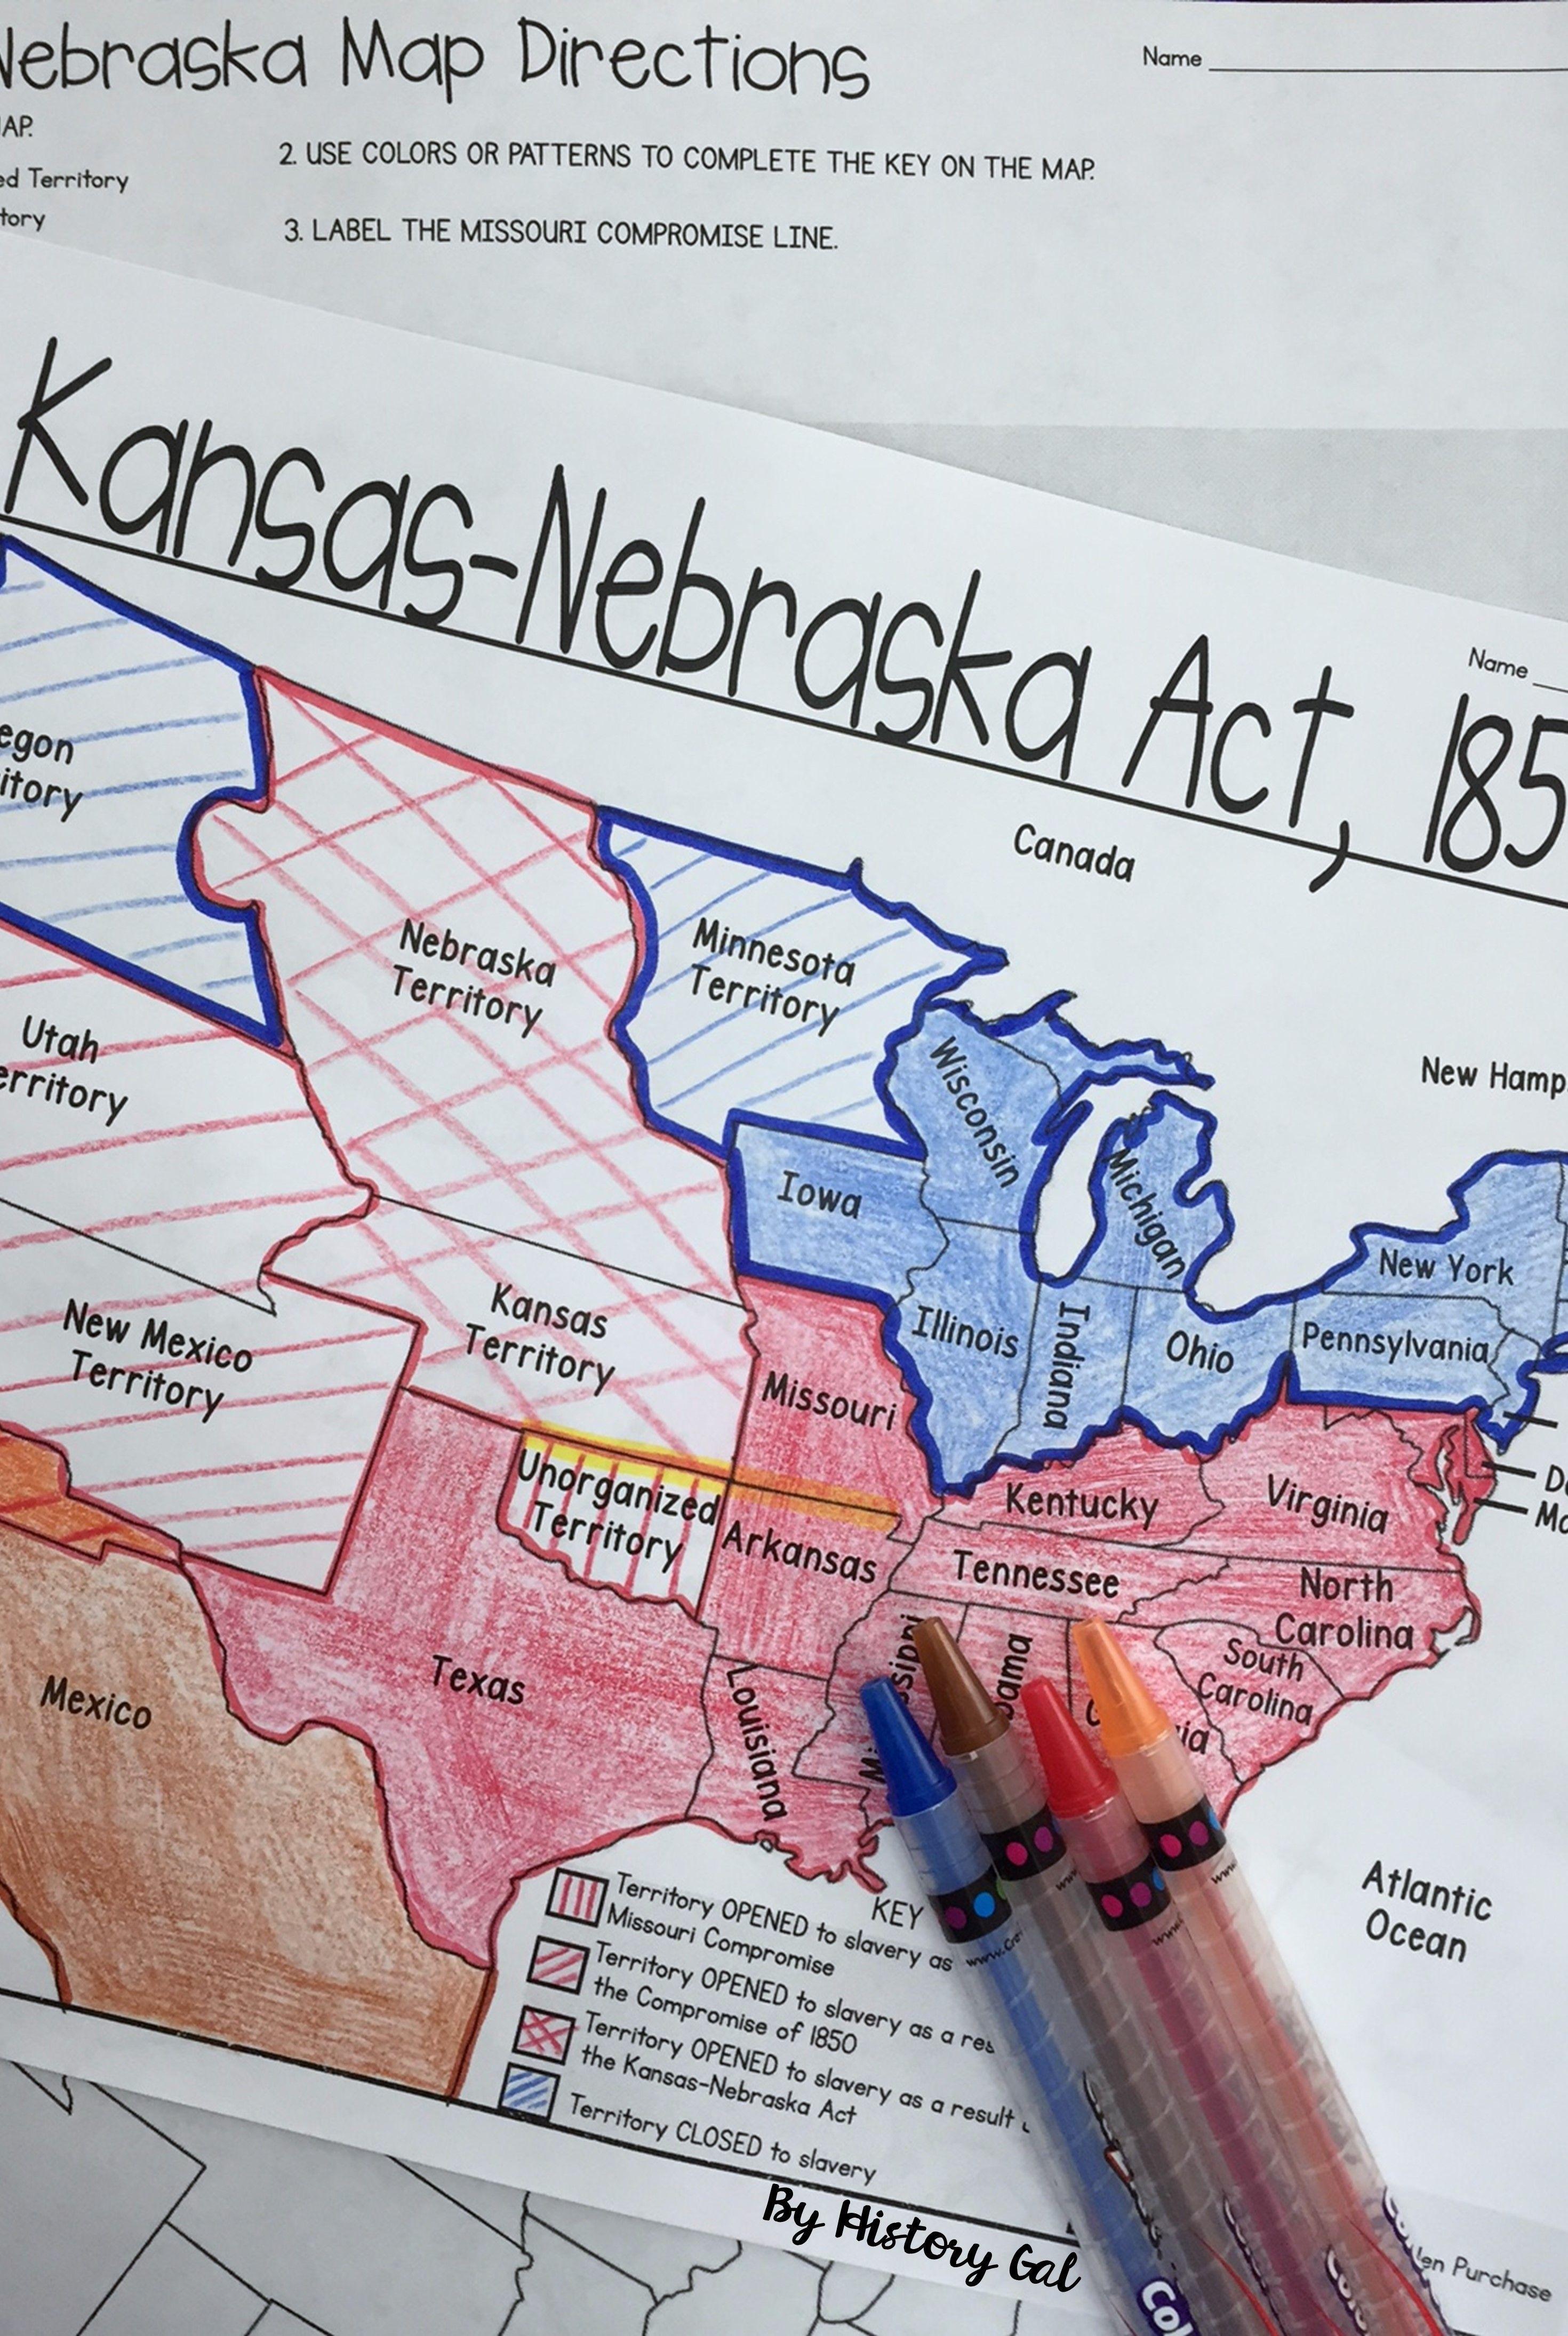 Kansas Nebraska Act Map Activity Print And Digital Middle School History Map Activities Teaching History